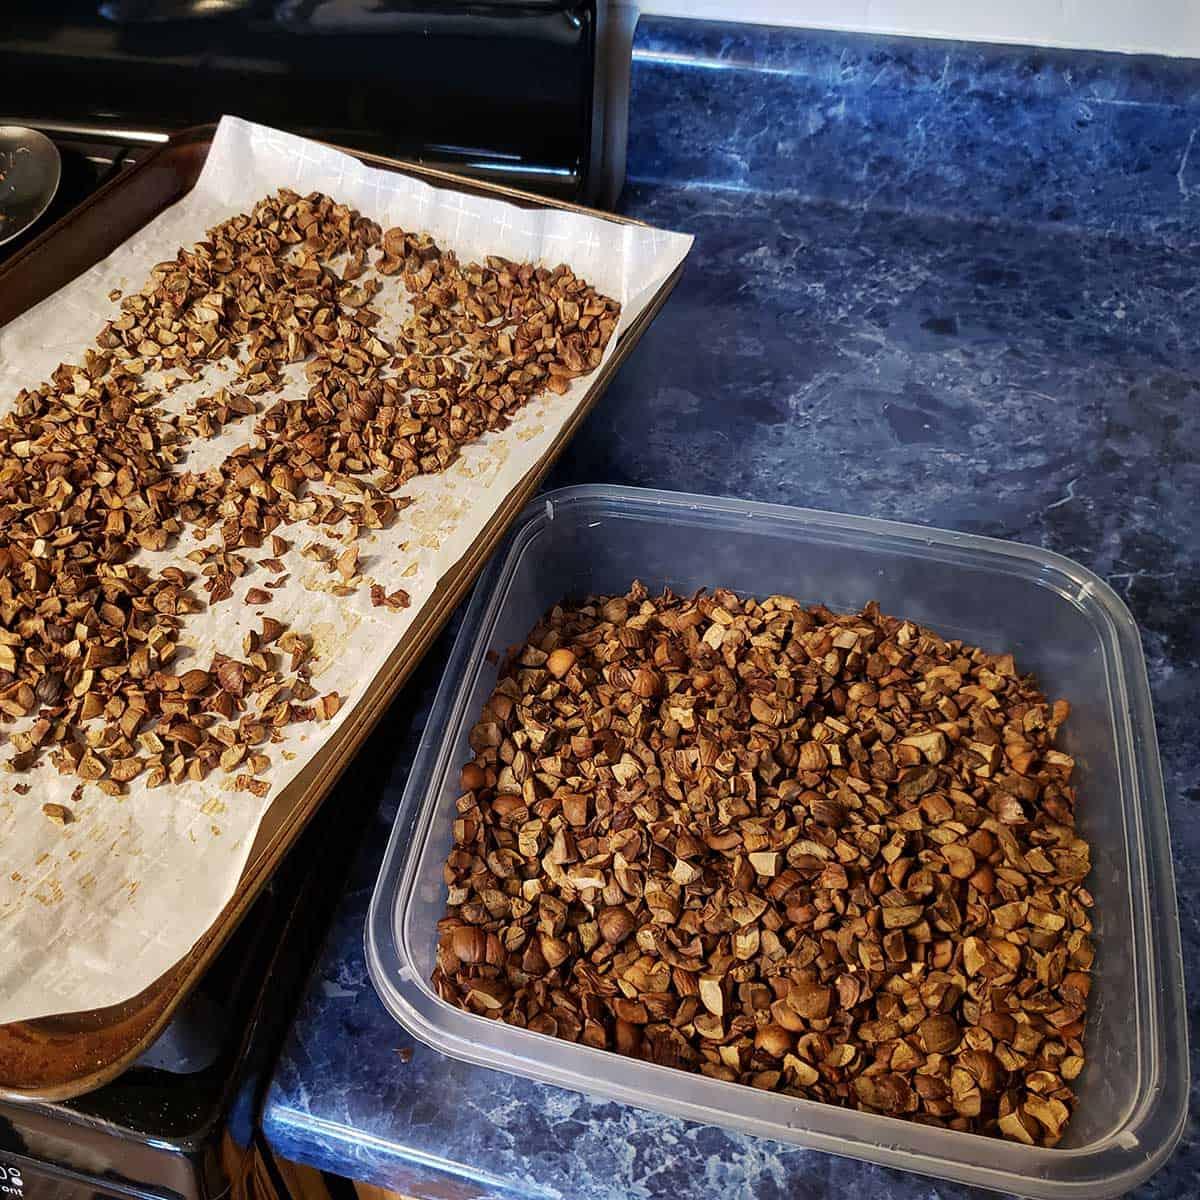 Drying the acorns